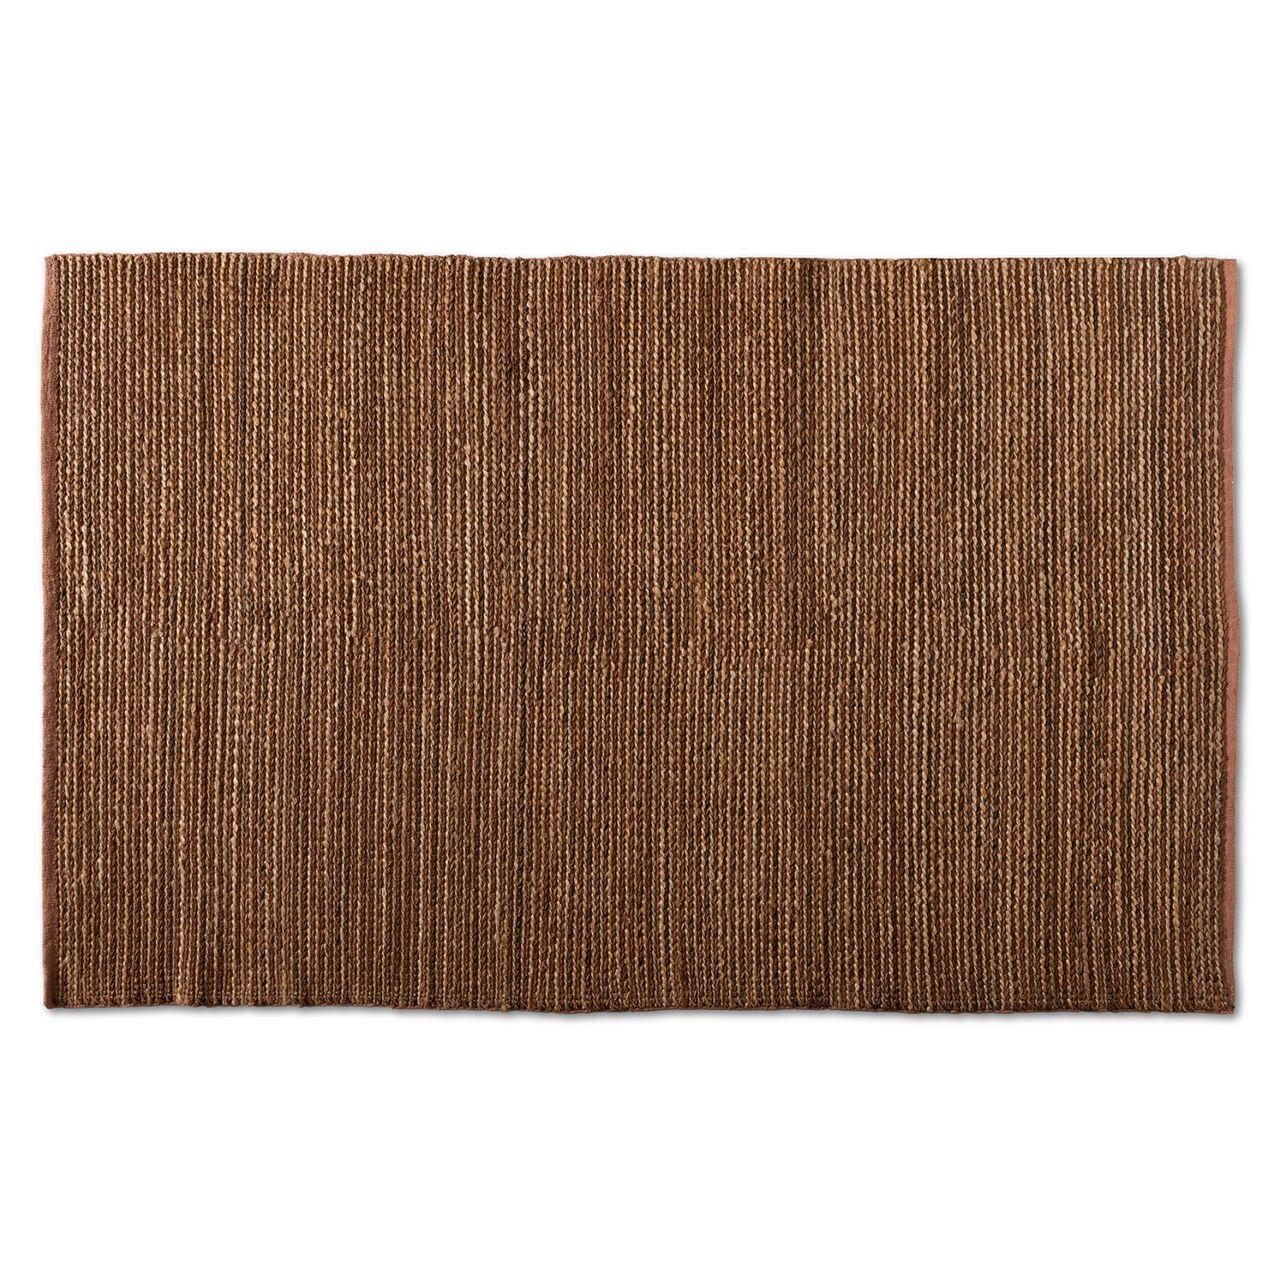 Baxton Studio Zaguri Natural Handwoven Leather Blend Area Rug